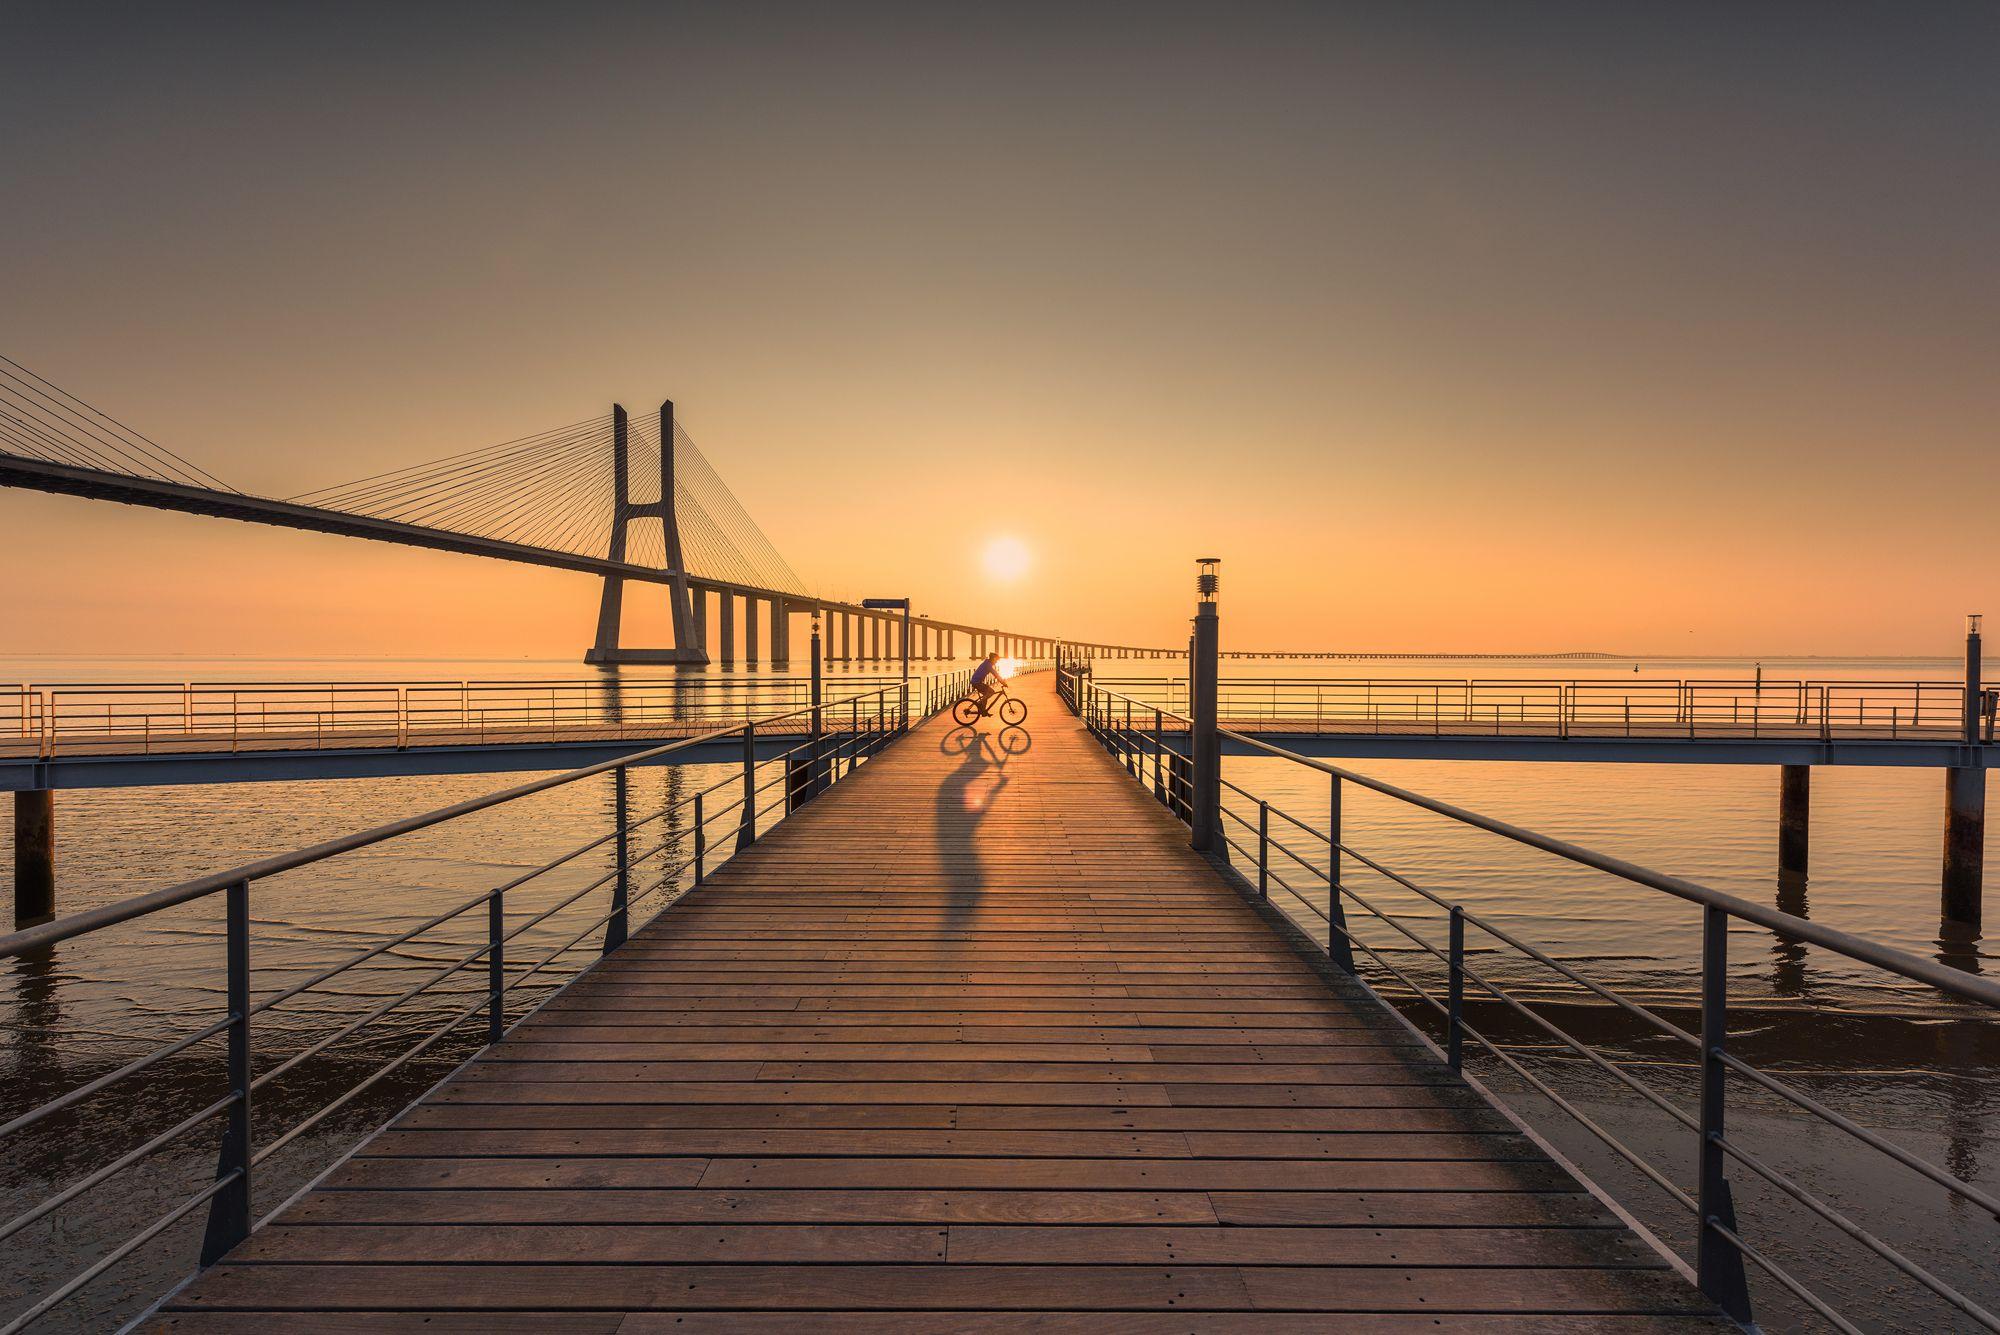 viaje fotografico portugal